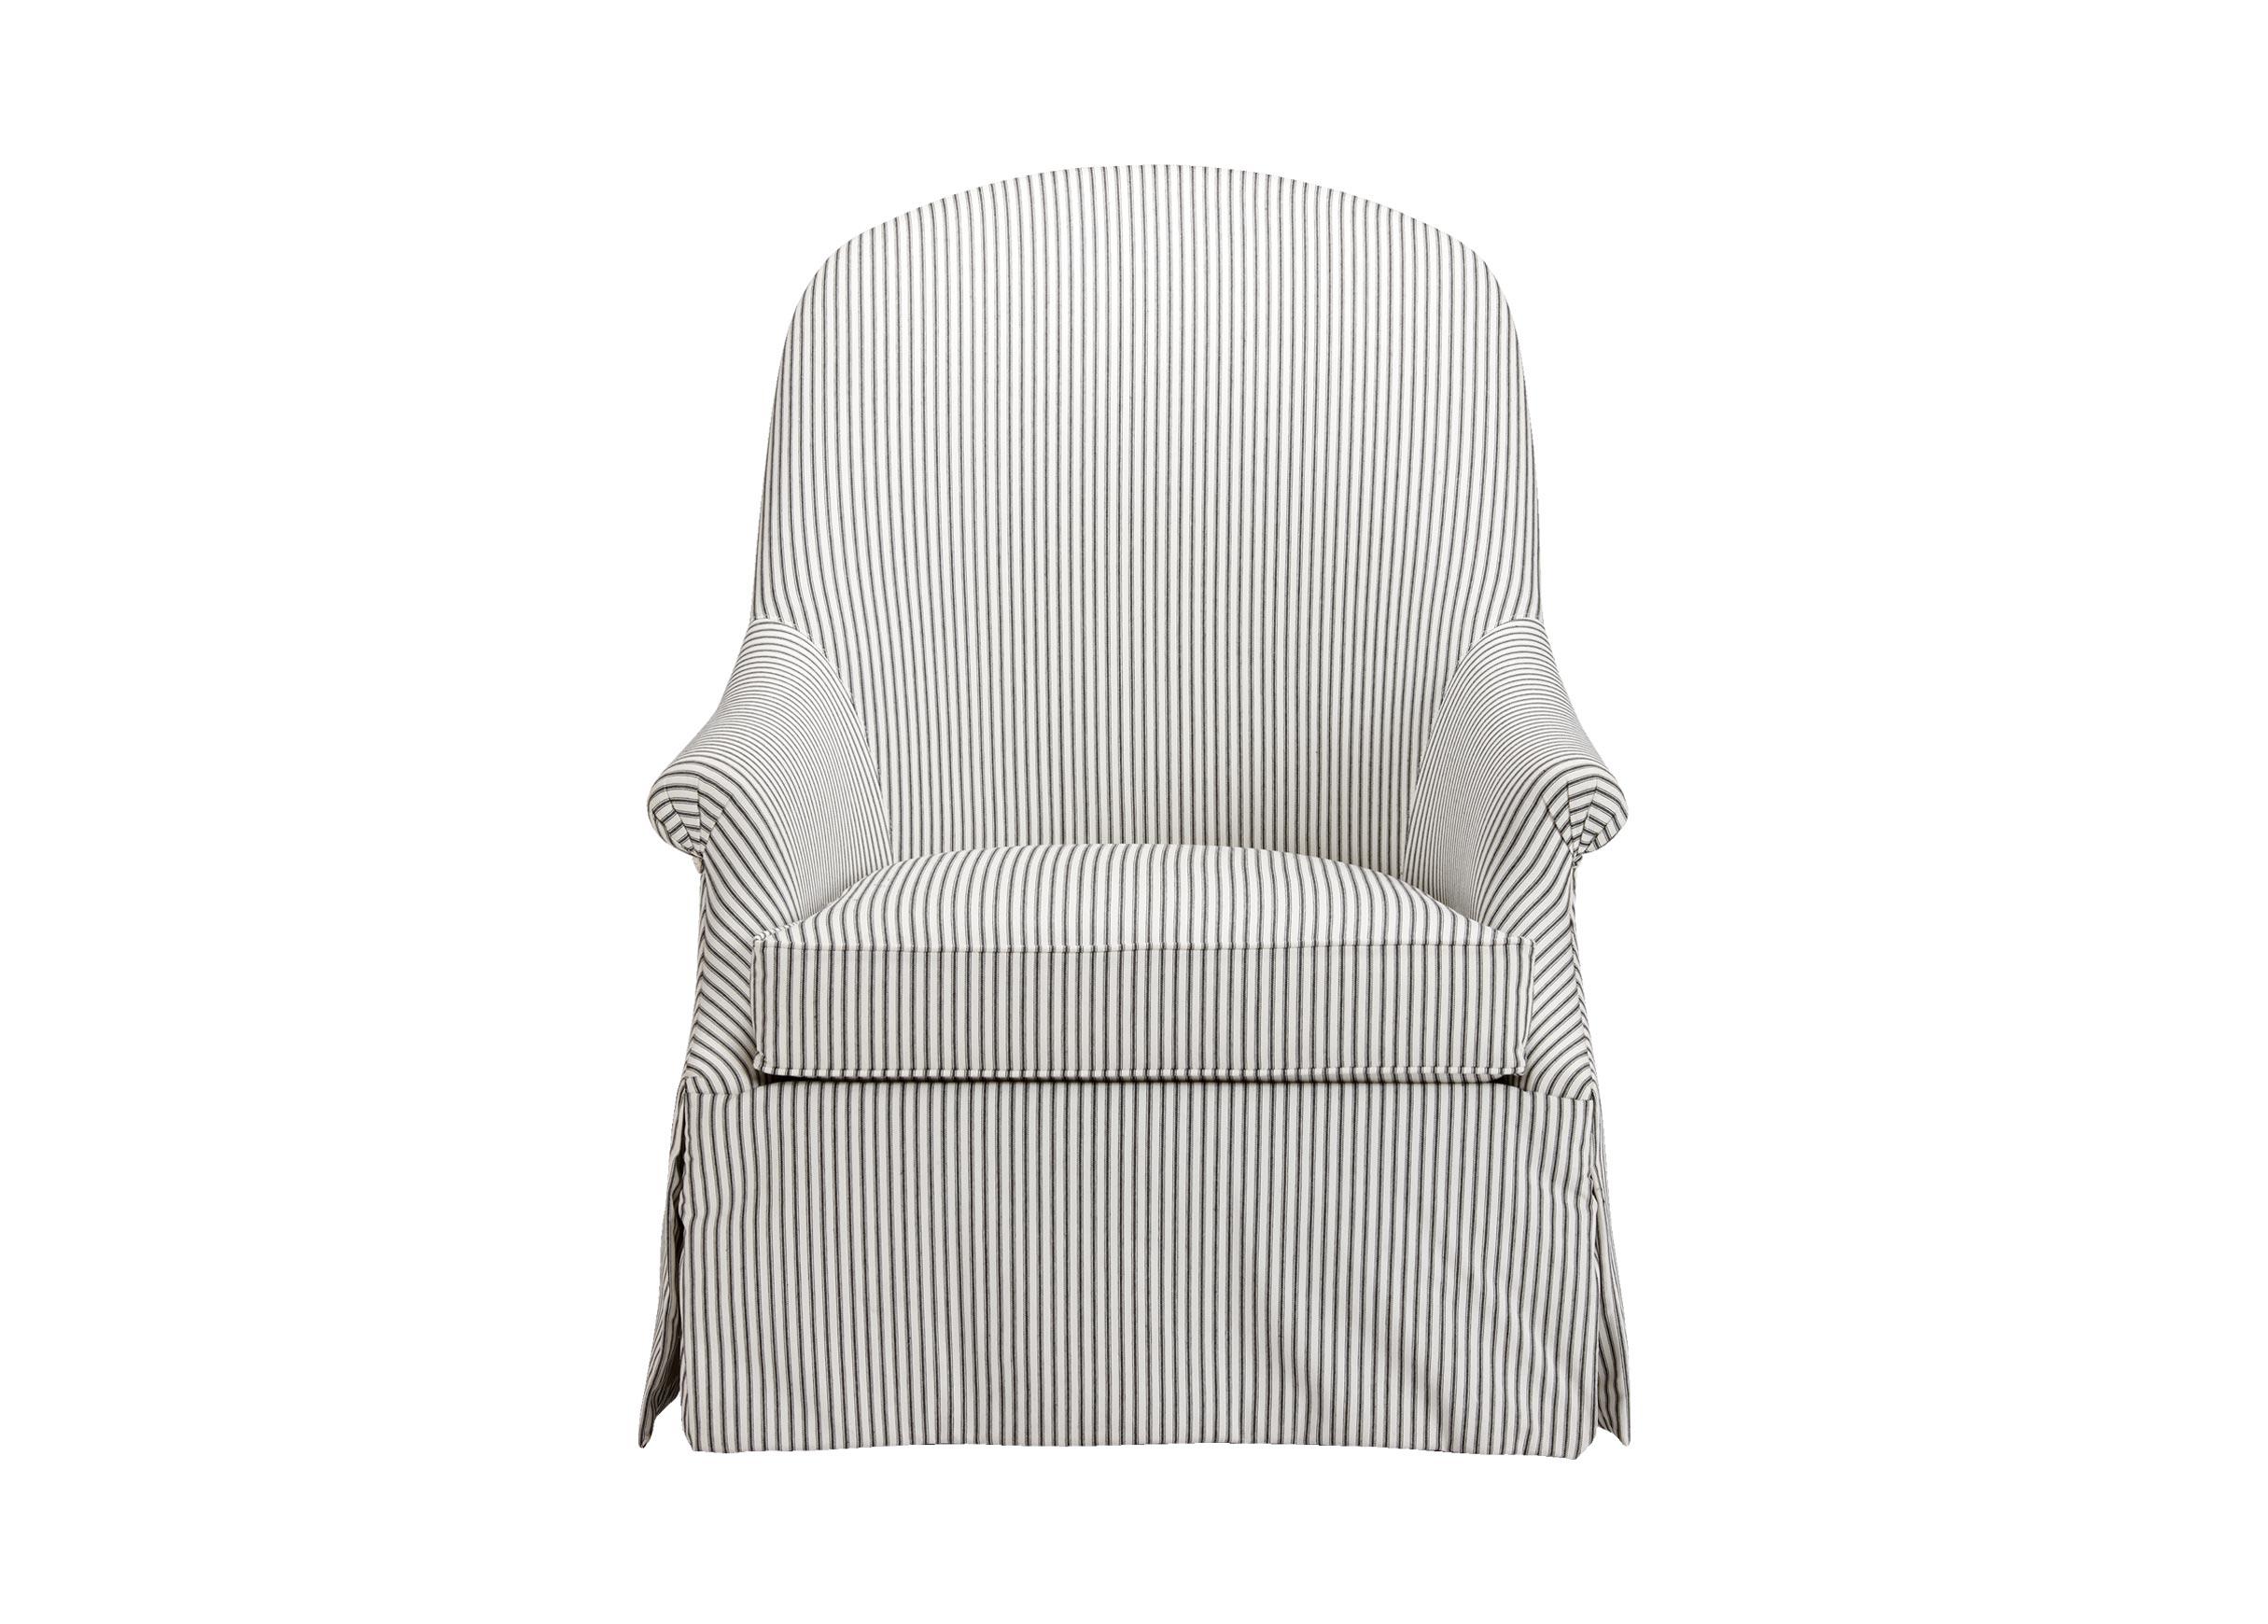 Beau Hamlet Swivel Chair